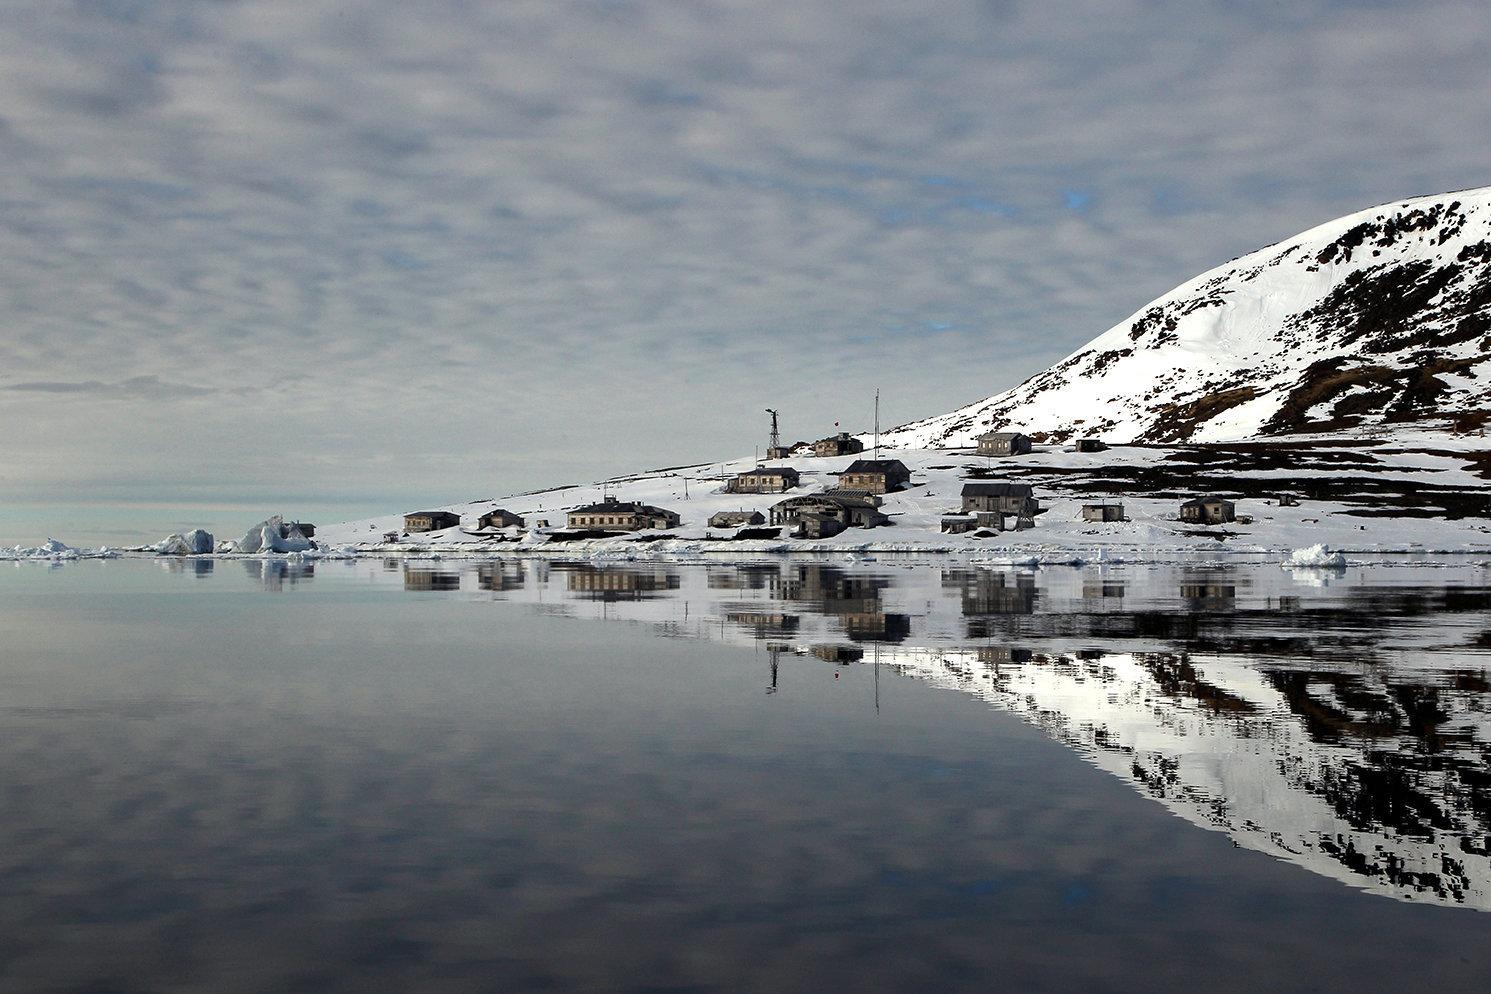 A polar station on the shore of Tikhaya Bay on Hooker Island at the Franz Josef Land Archipelago